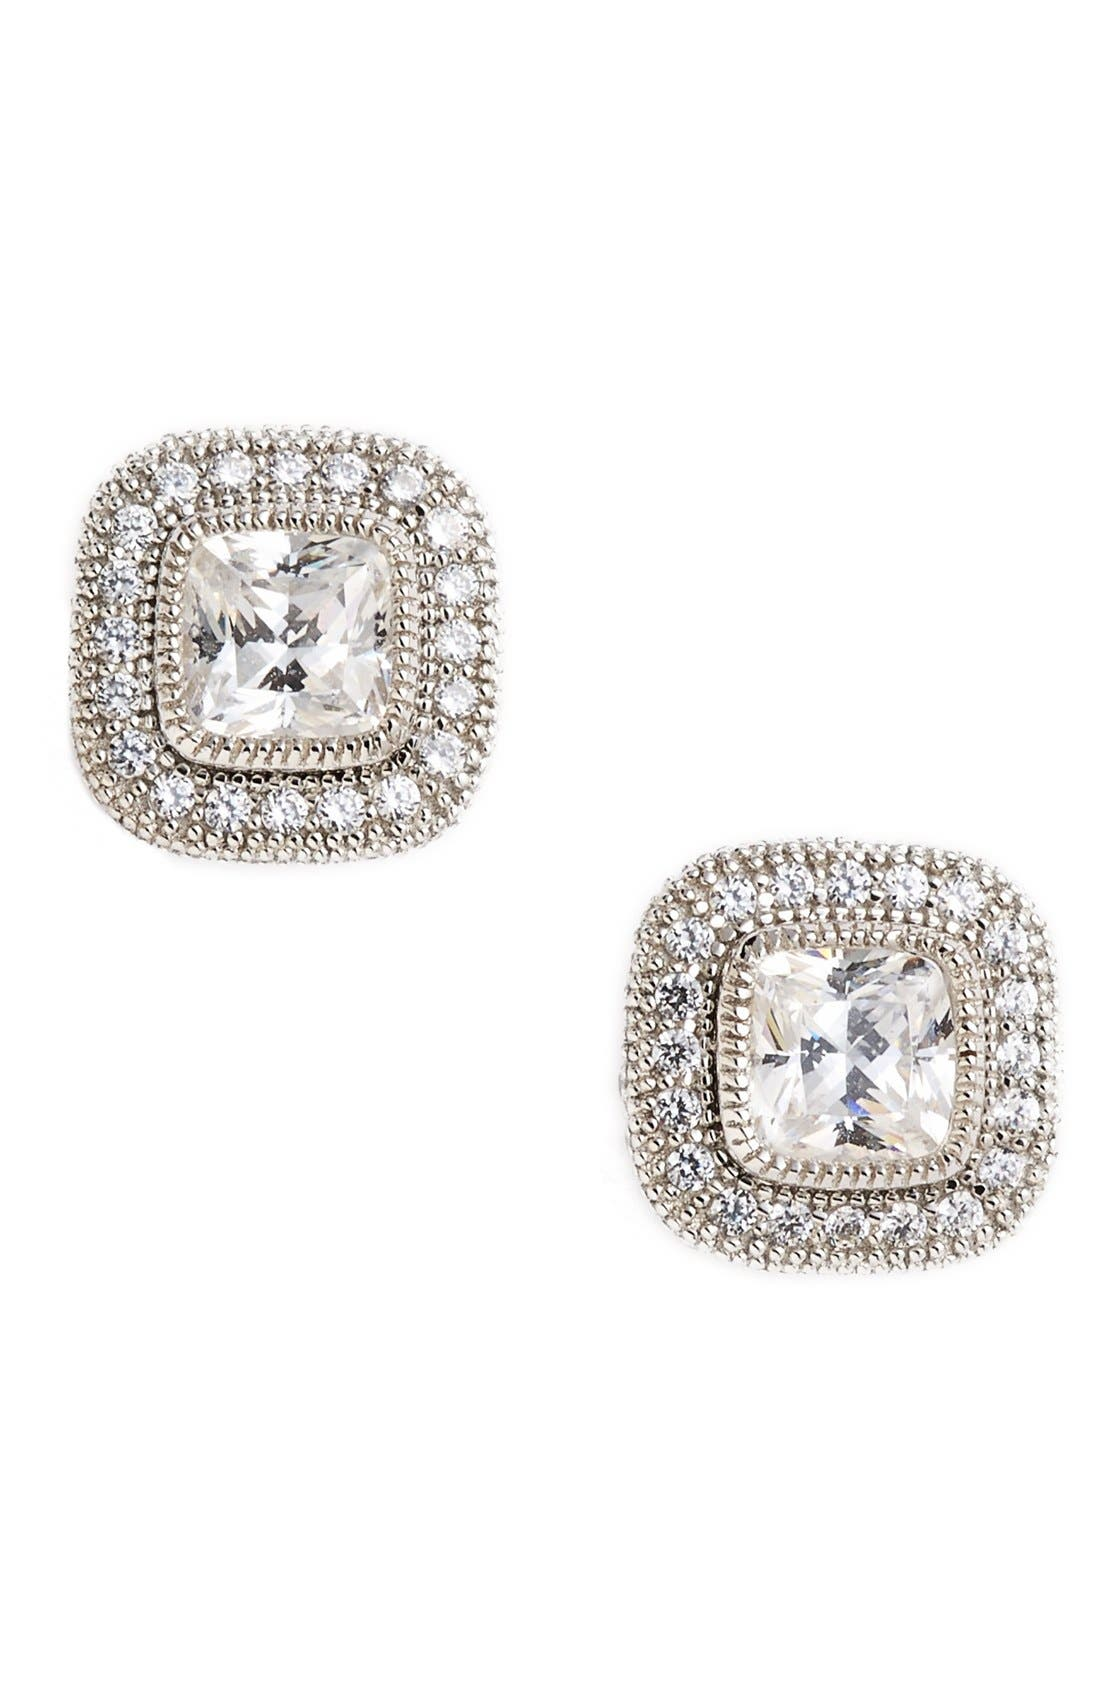 Main Image - Lafonn'Lassaire' Square Stud Earrings